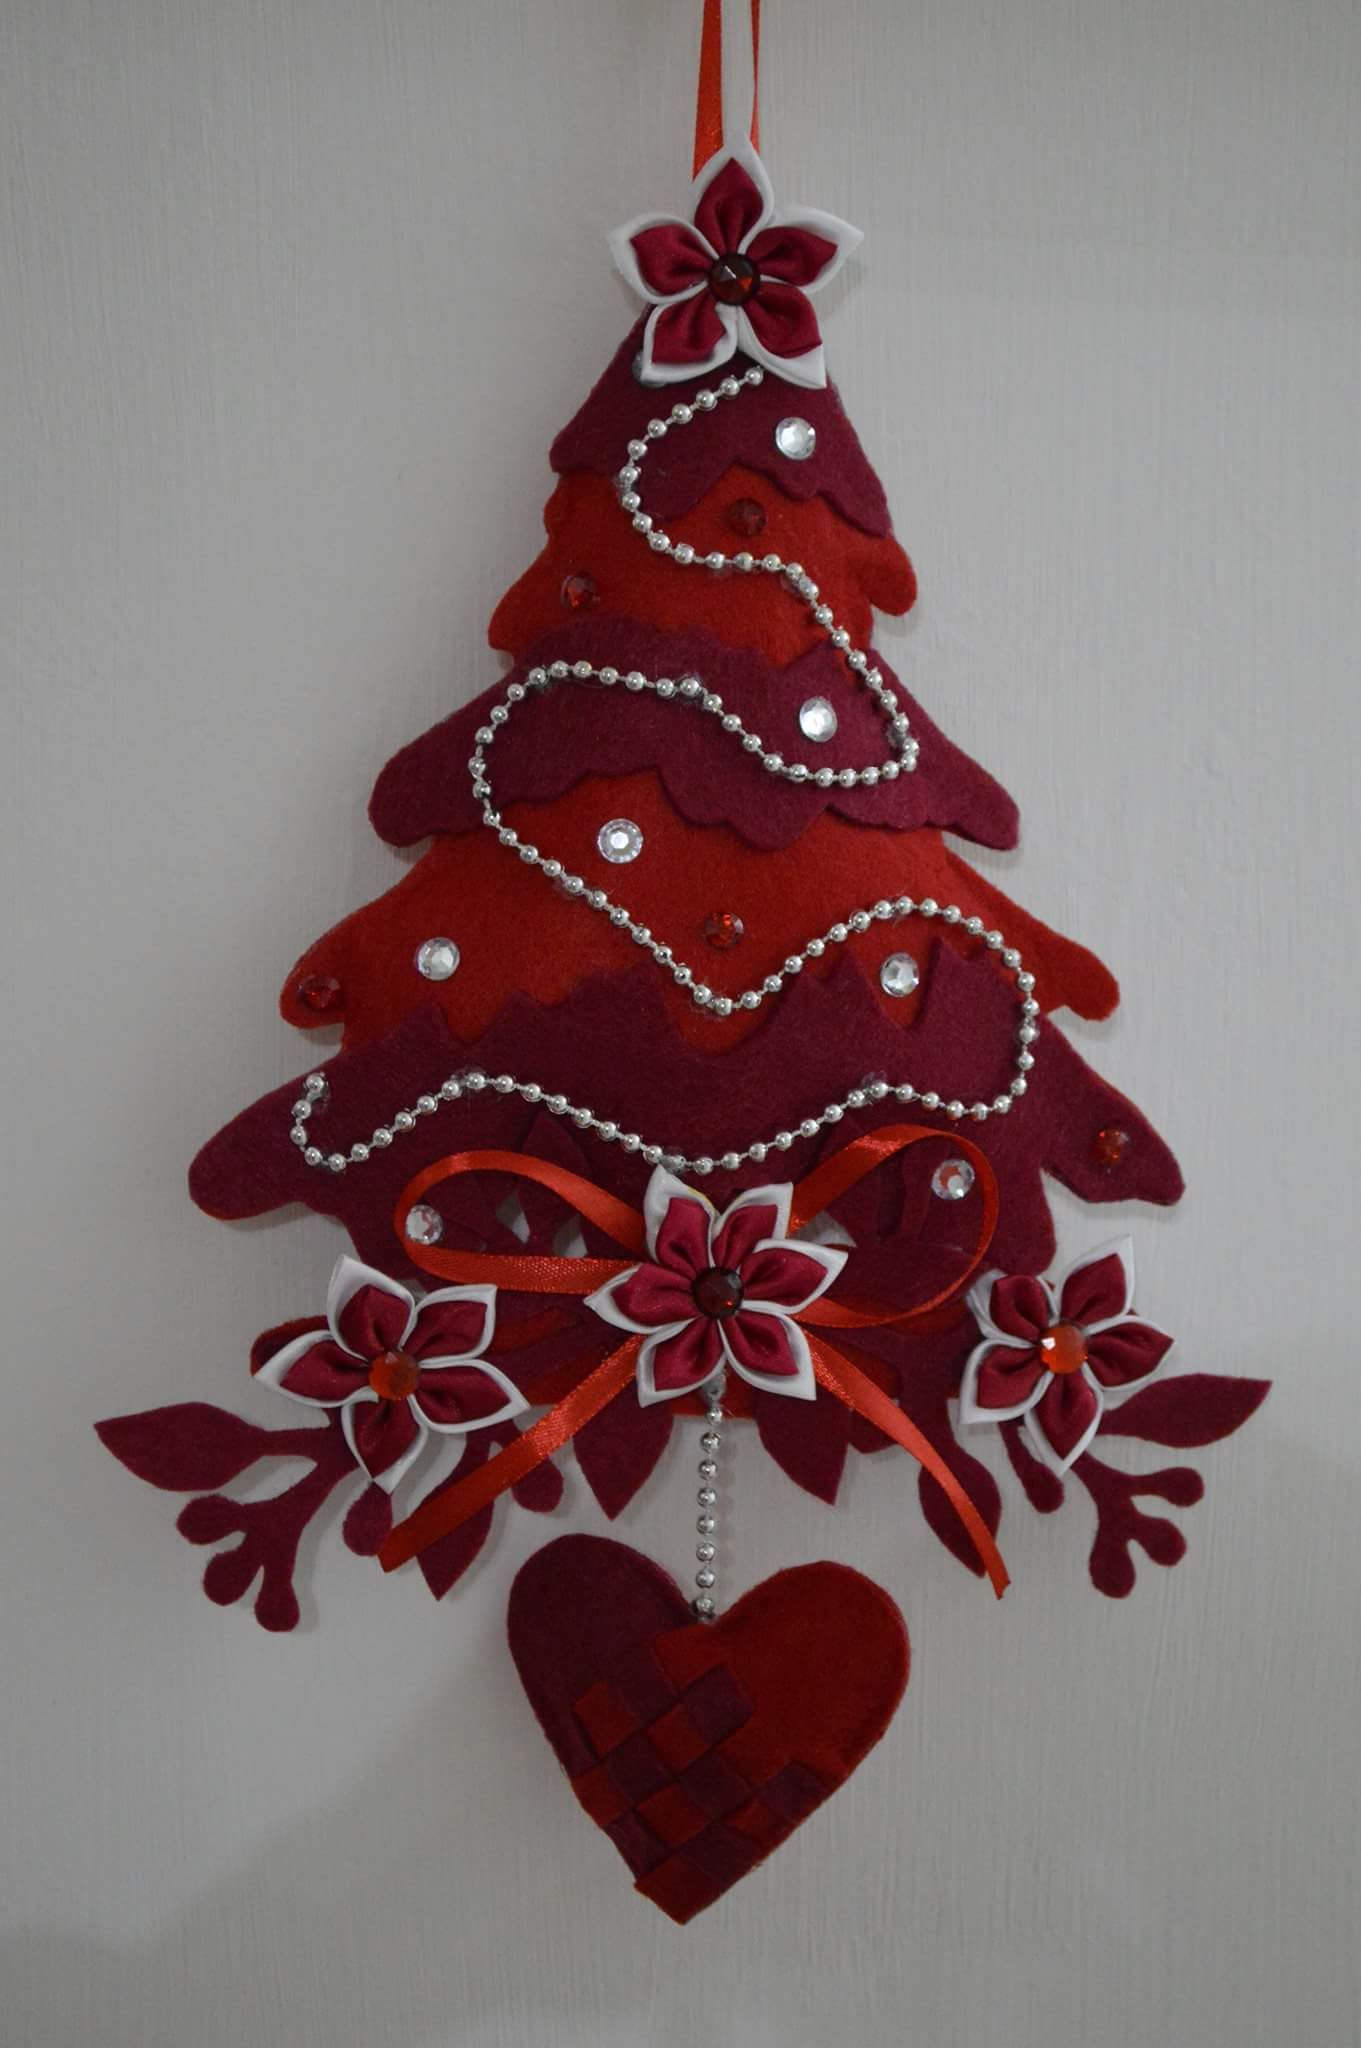 Alberello natale feltro pinterest natale alberi di natale e ornamento di natale - Pinterest natale ...